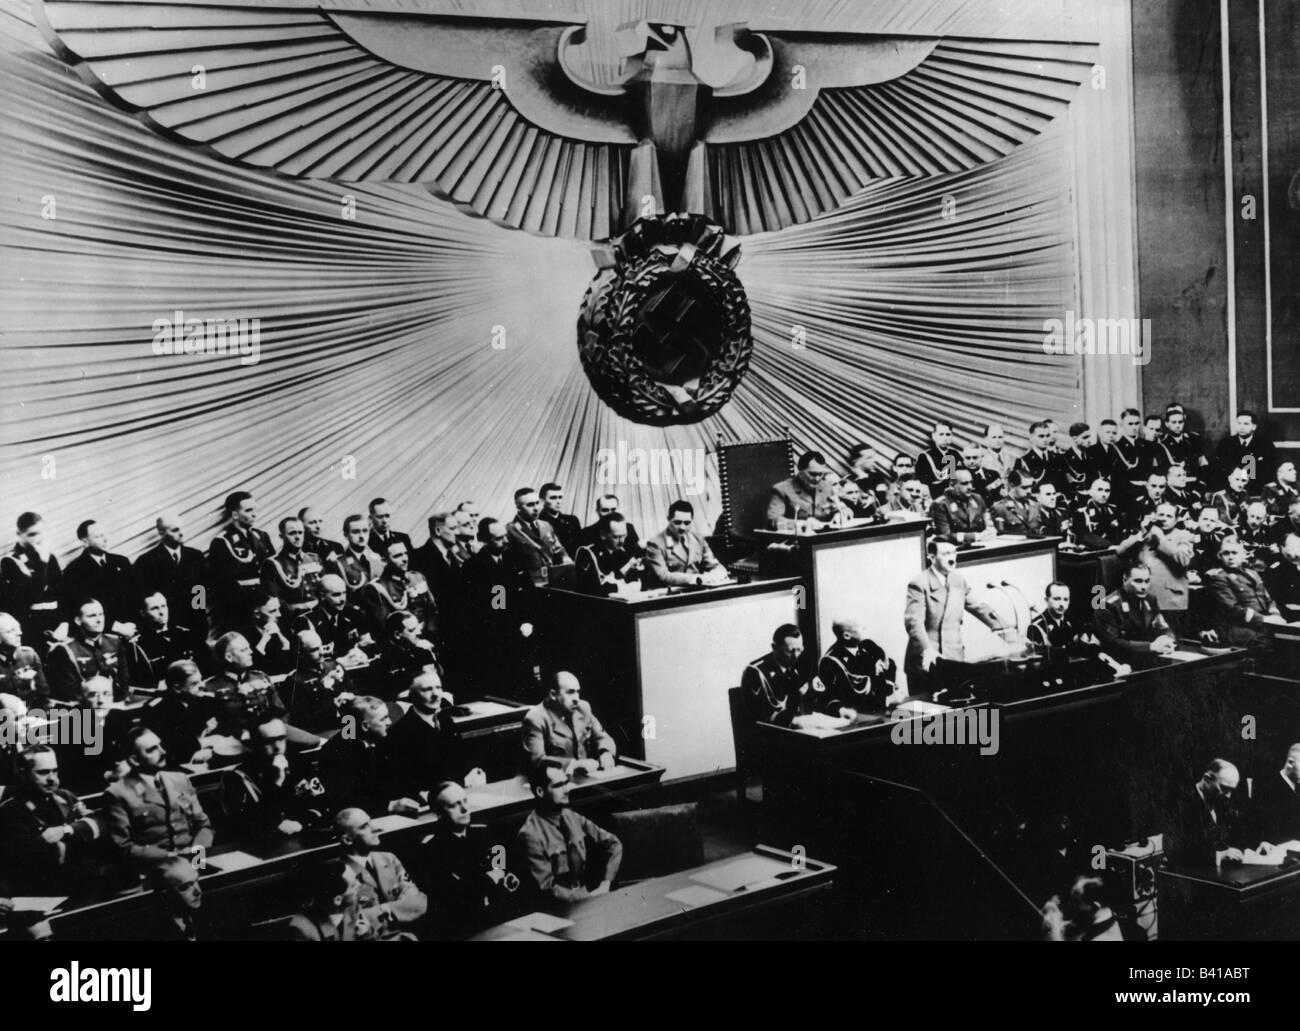 events, Second World War / WWII, Poland 1939, beginning of the war, 1.9.1939, speech of Adolf Hitler, Reichstag - Stock Image